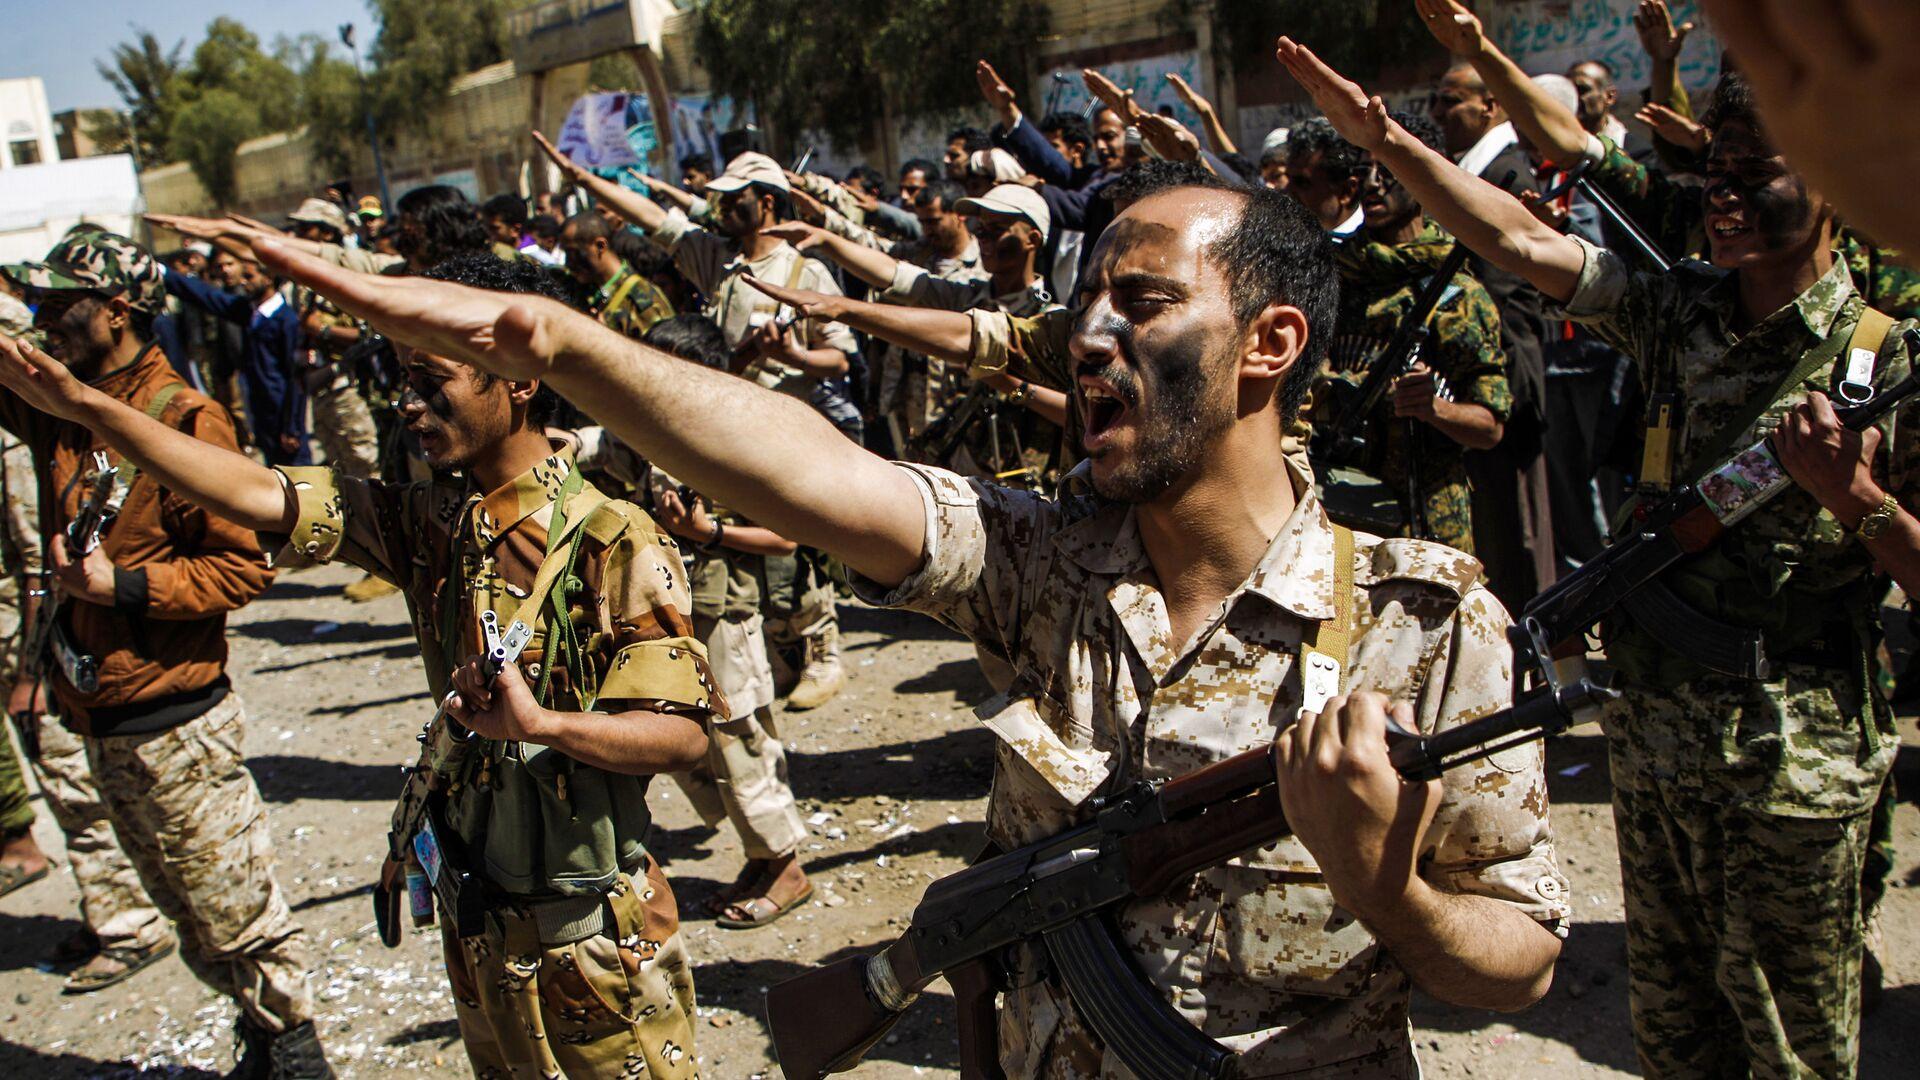 Truppe degli Huthi in Yemen - Sputnik Italia, 1920, 23.05.2021